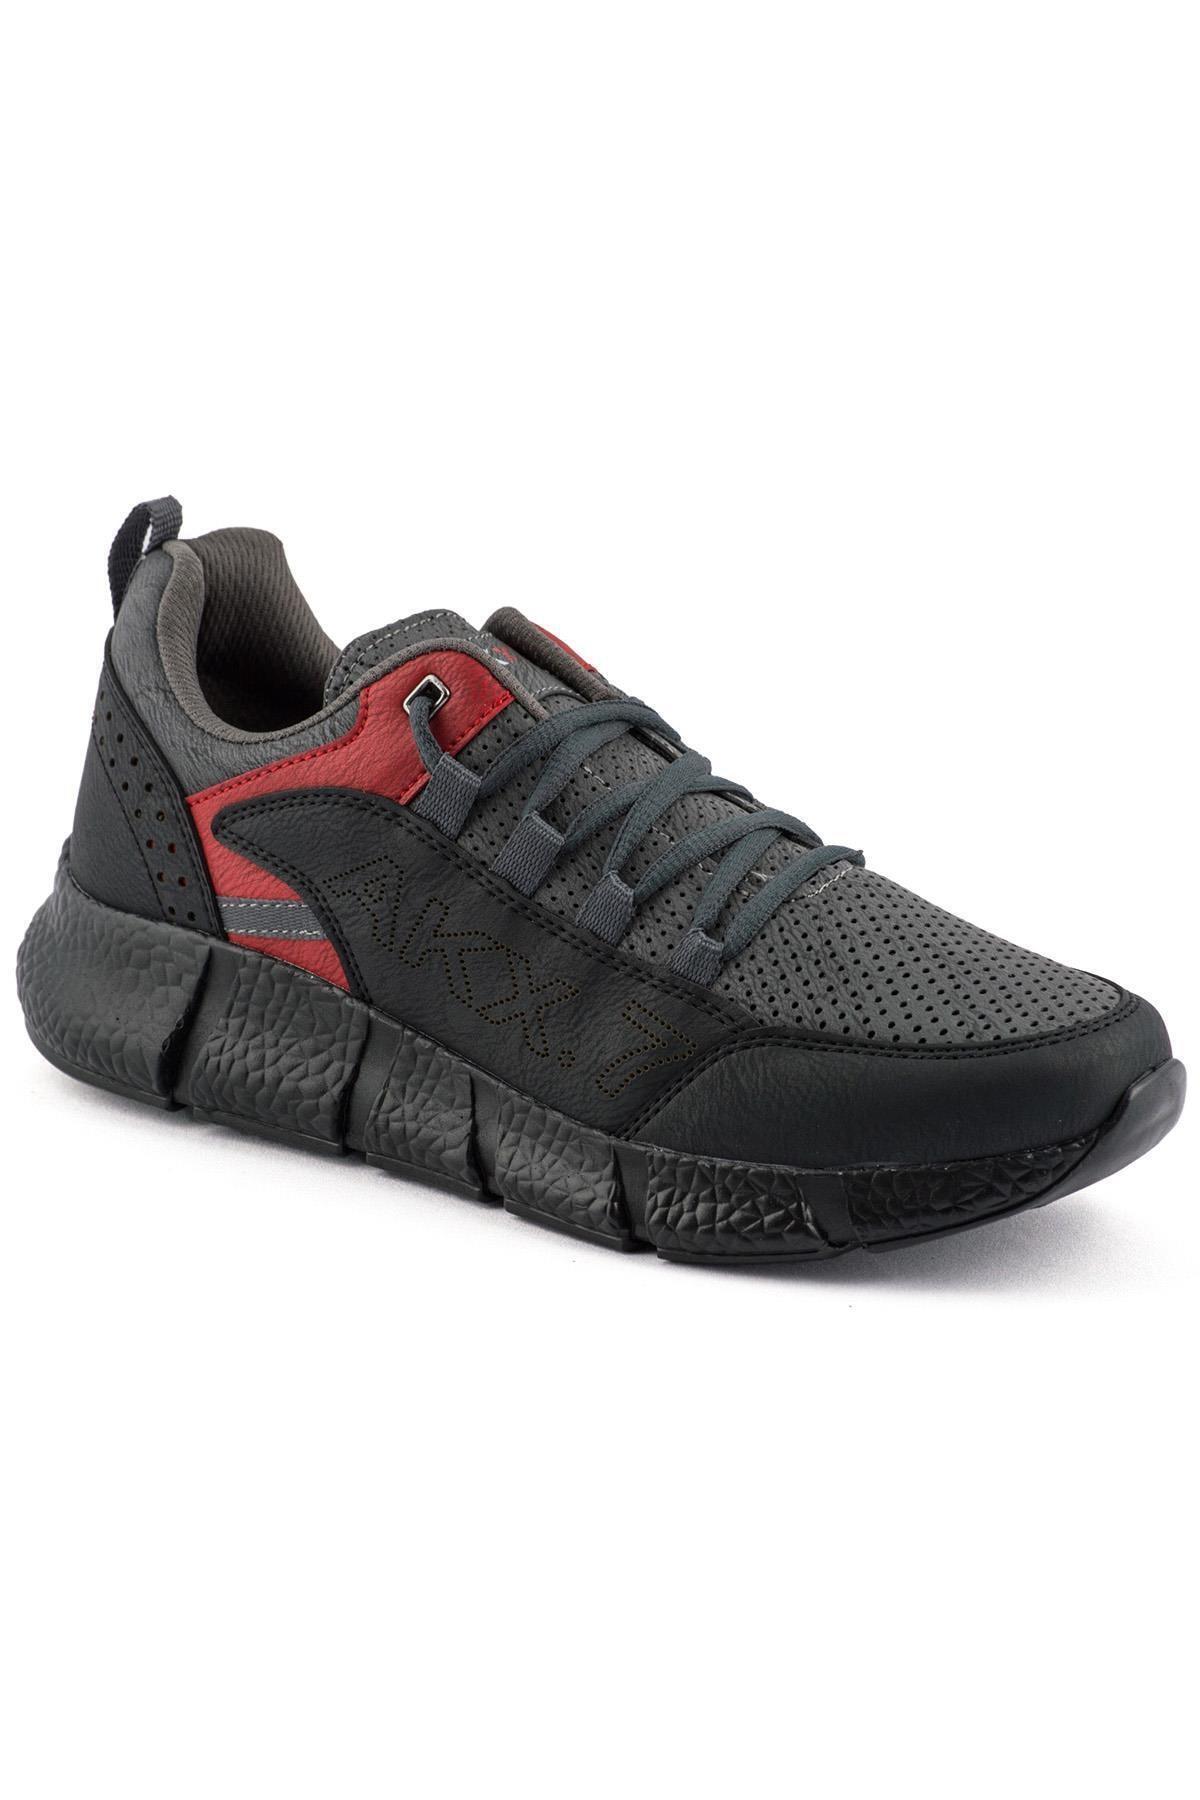 L.A Polo 021 Füme Siyah Erkek Spor Ayakkabı 1